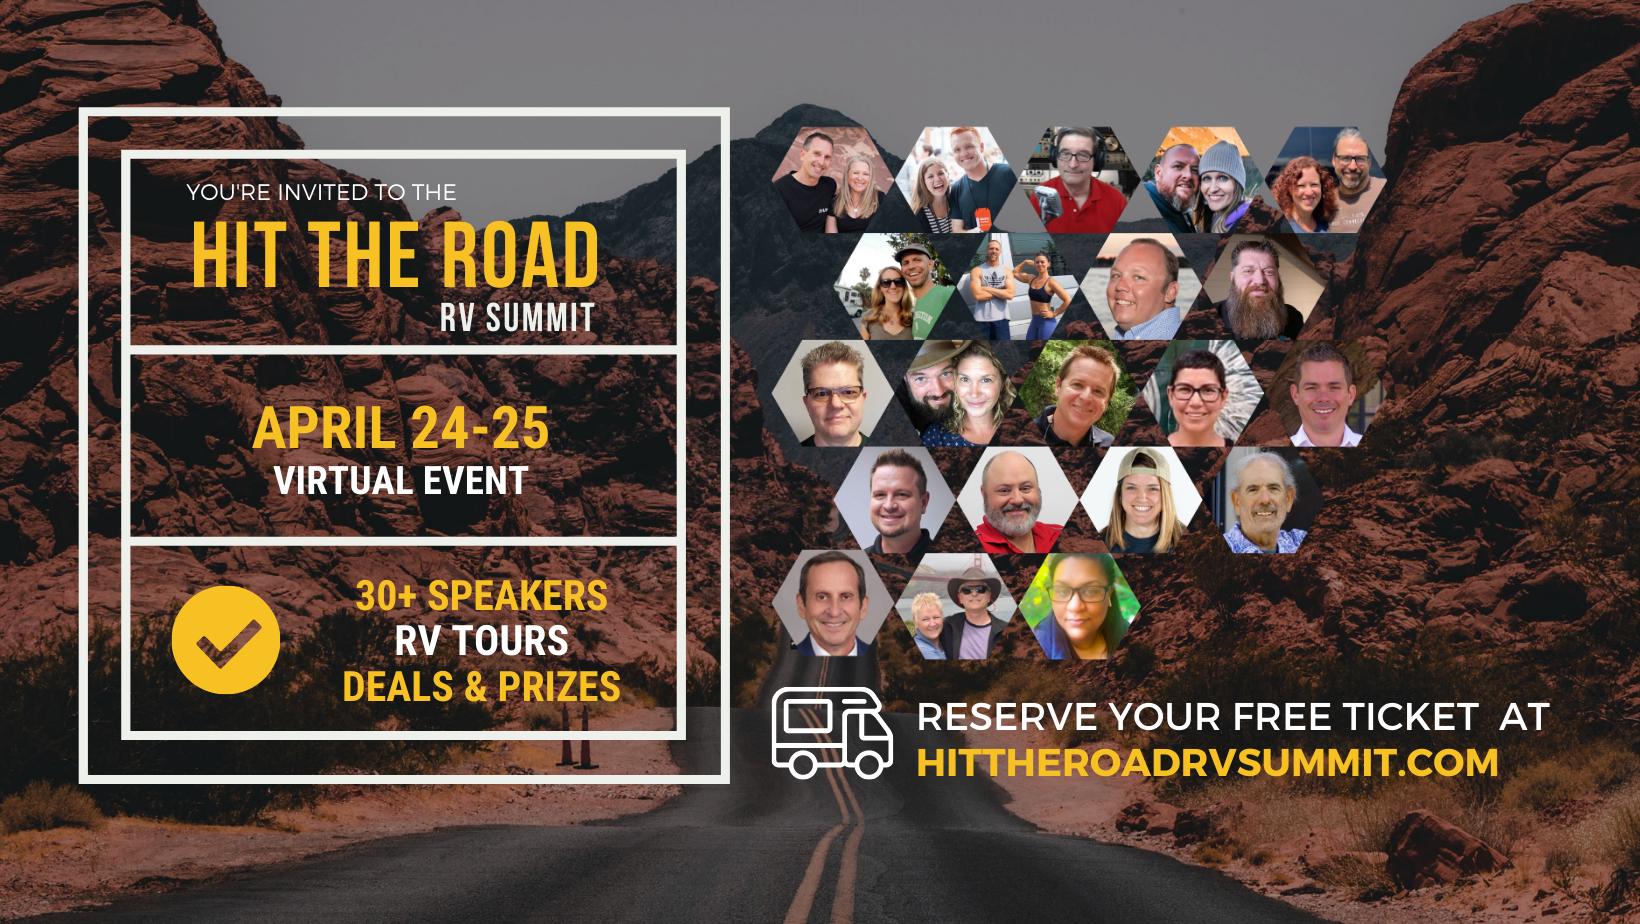 hit the road rv summit